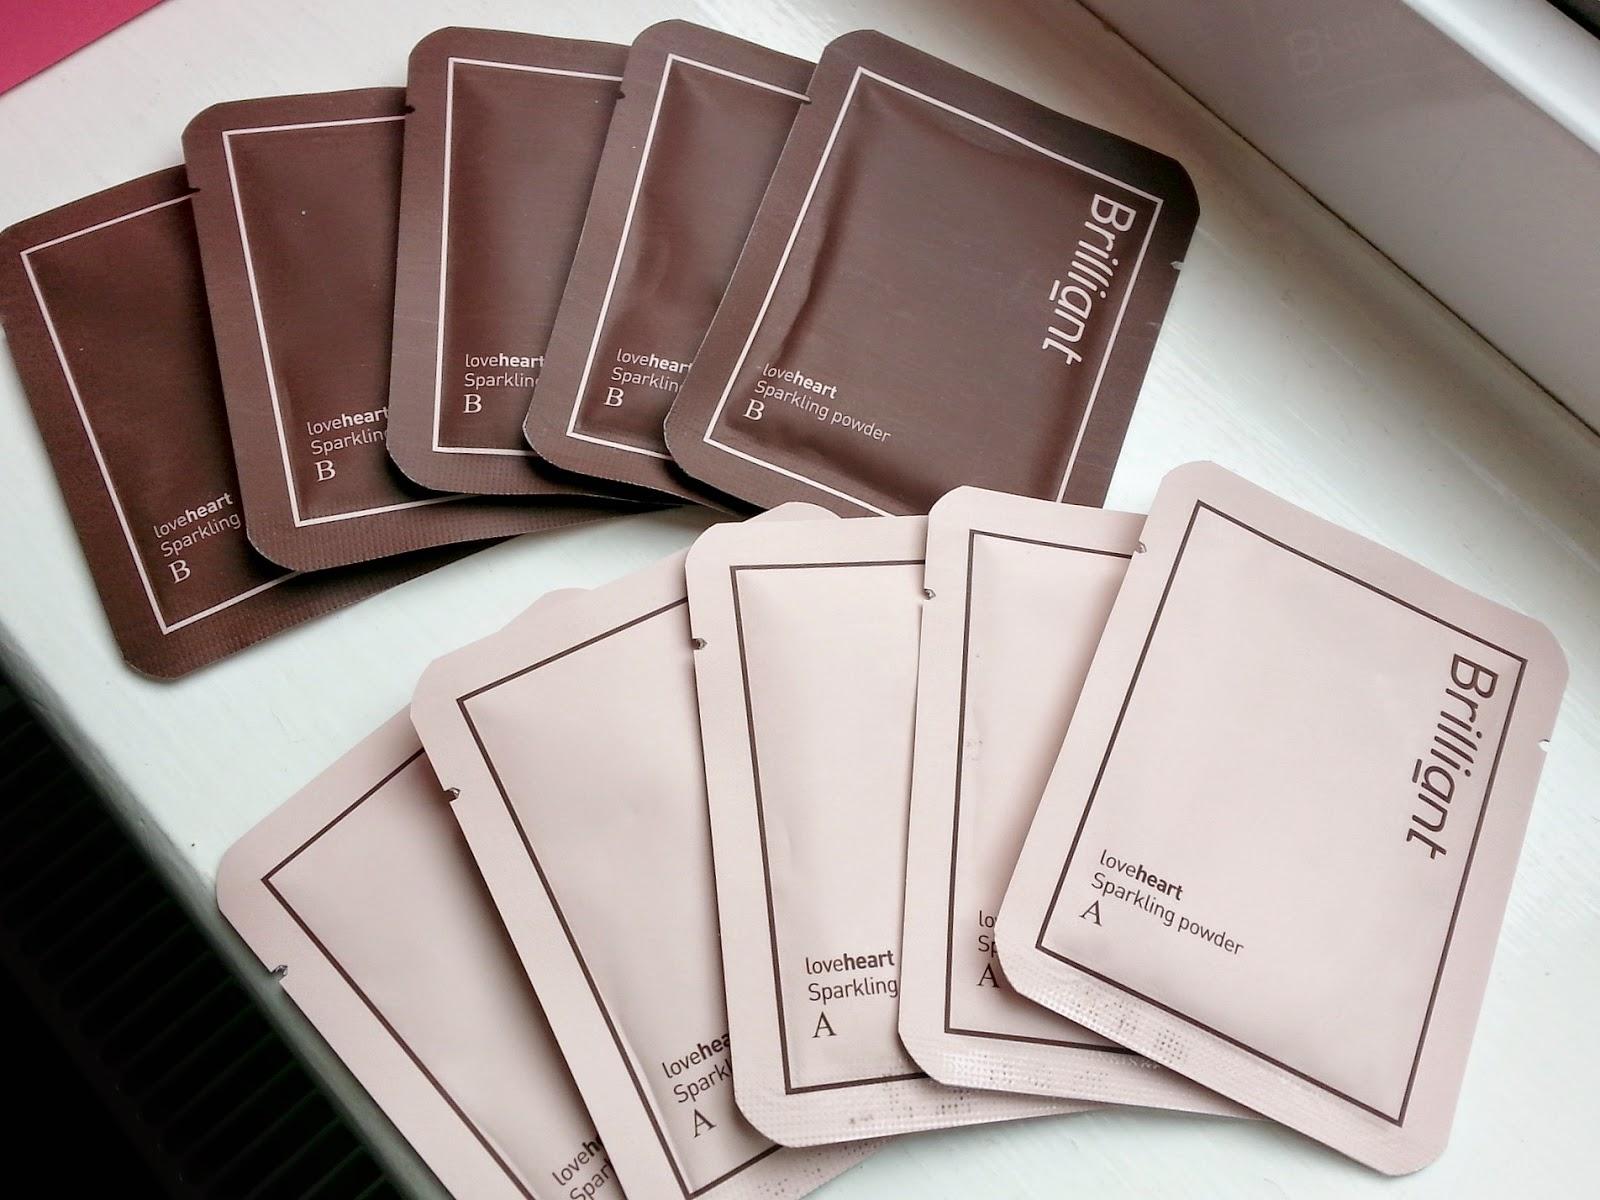 Memebox, Bubble Pop Cosmetics, CO2 skincare